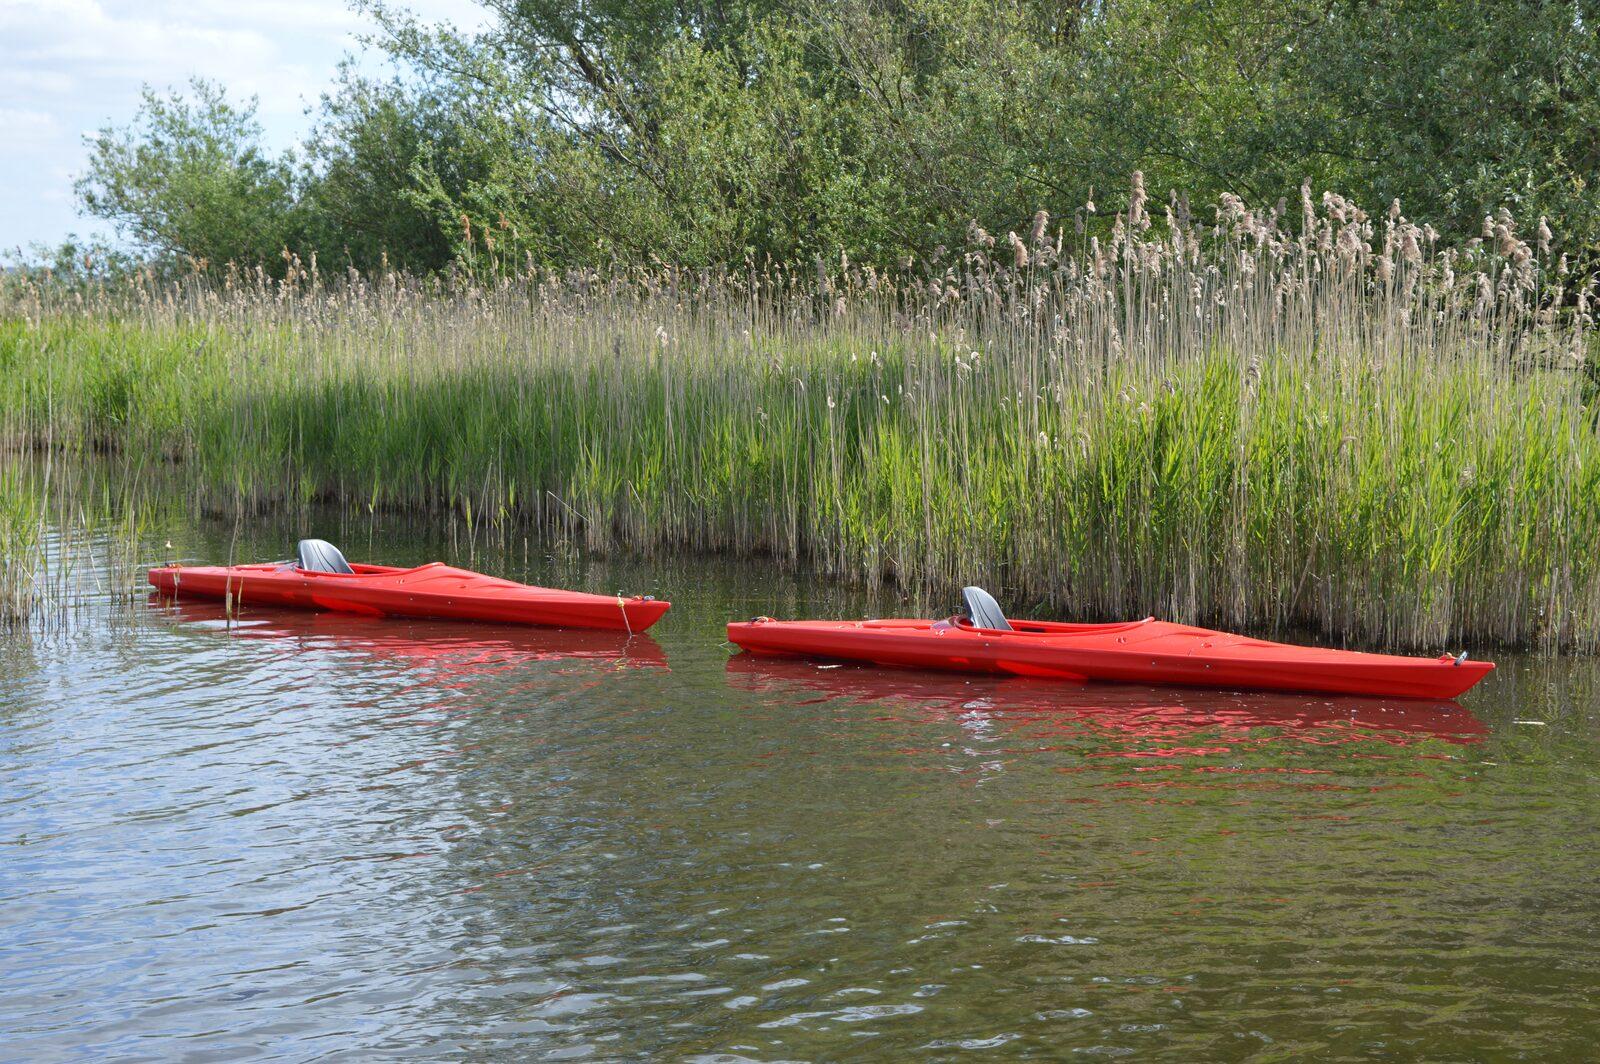 Kayak en Kano's verhuur